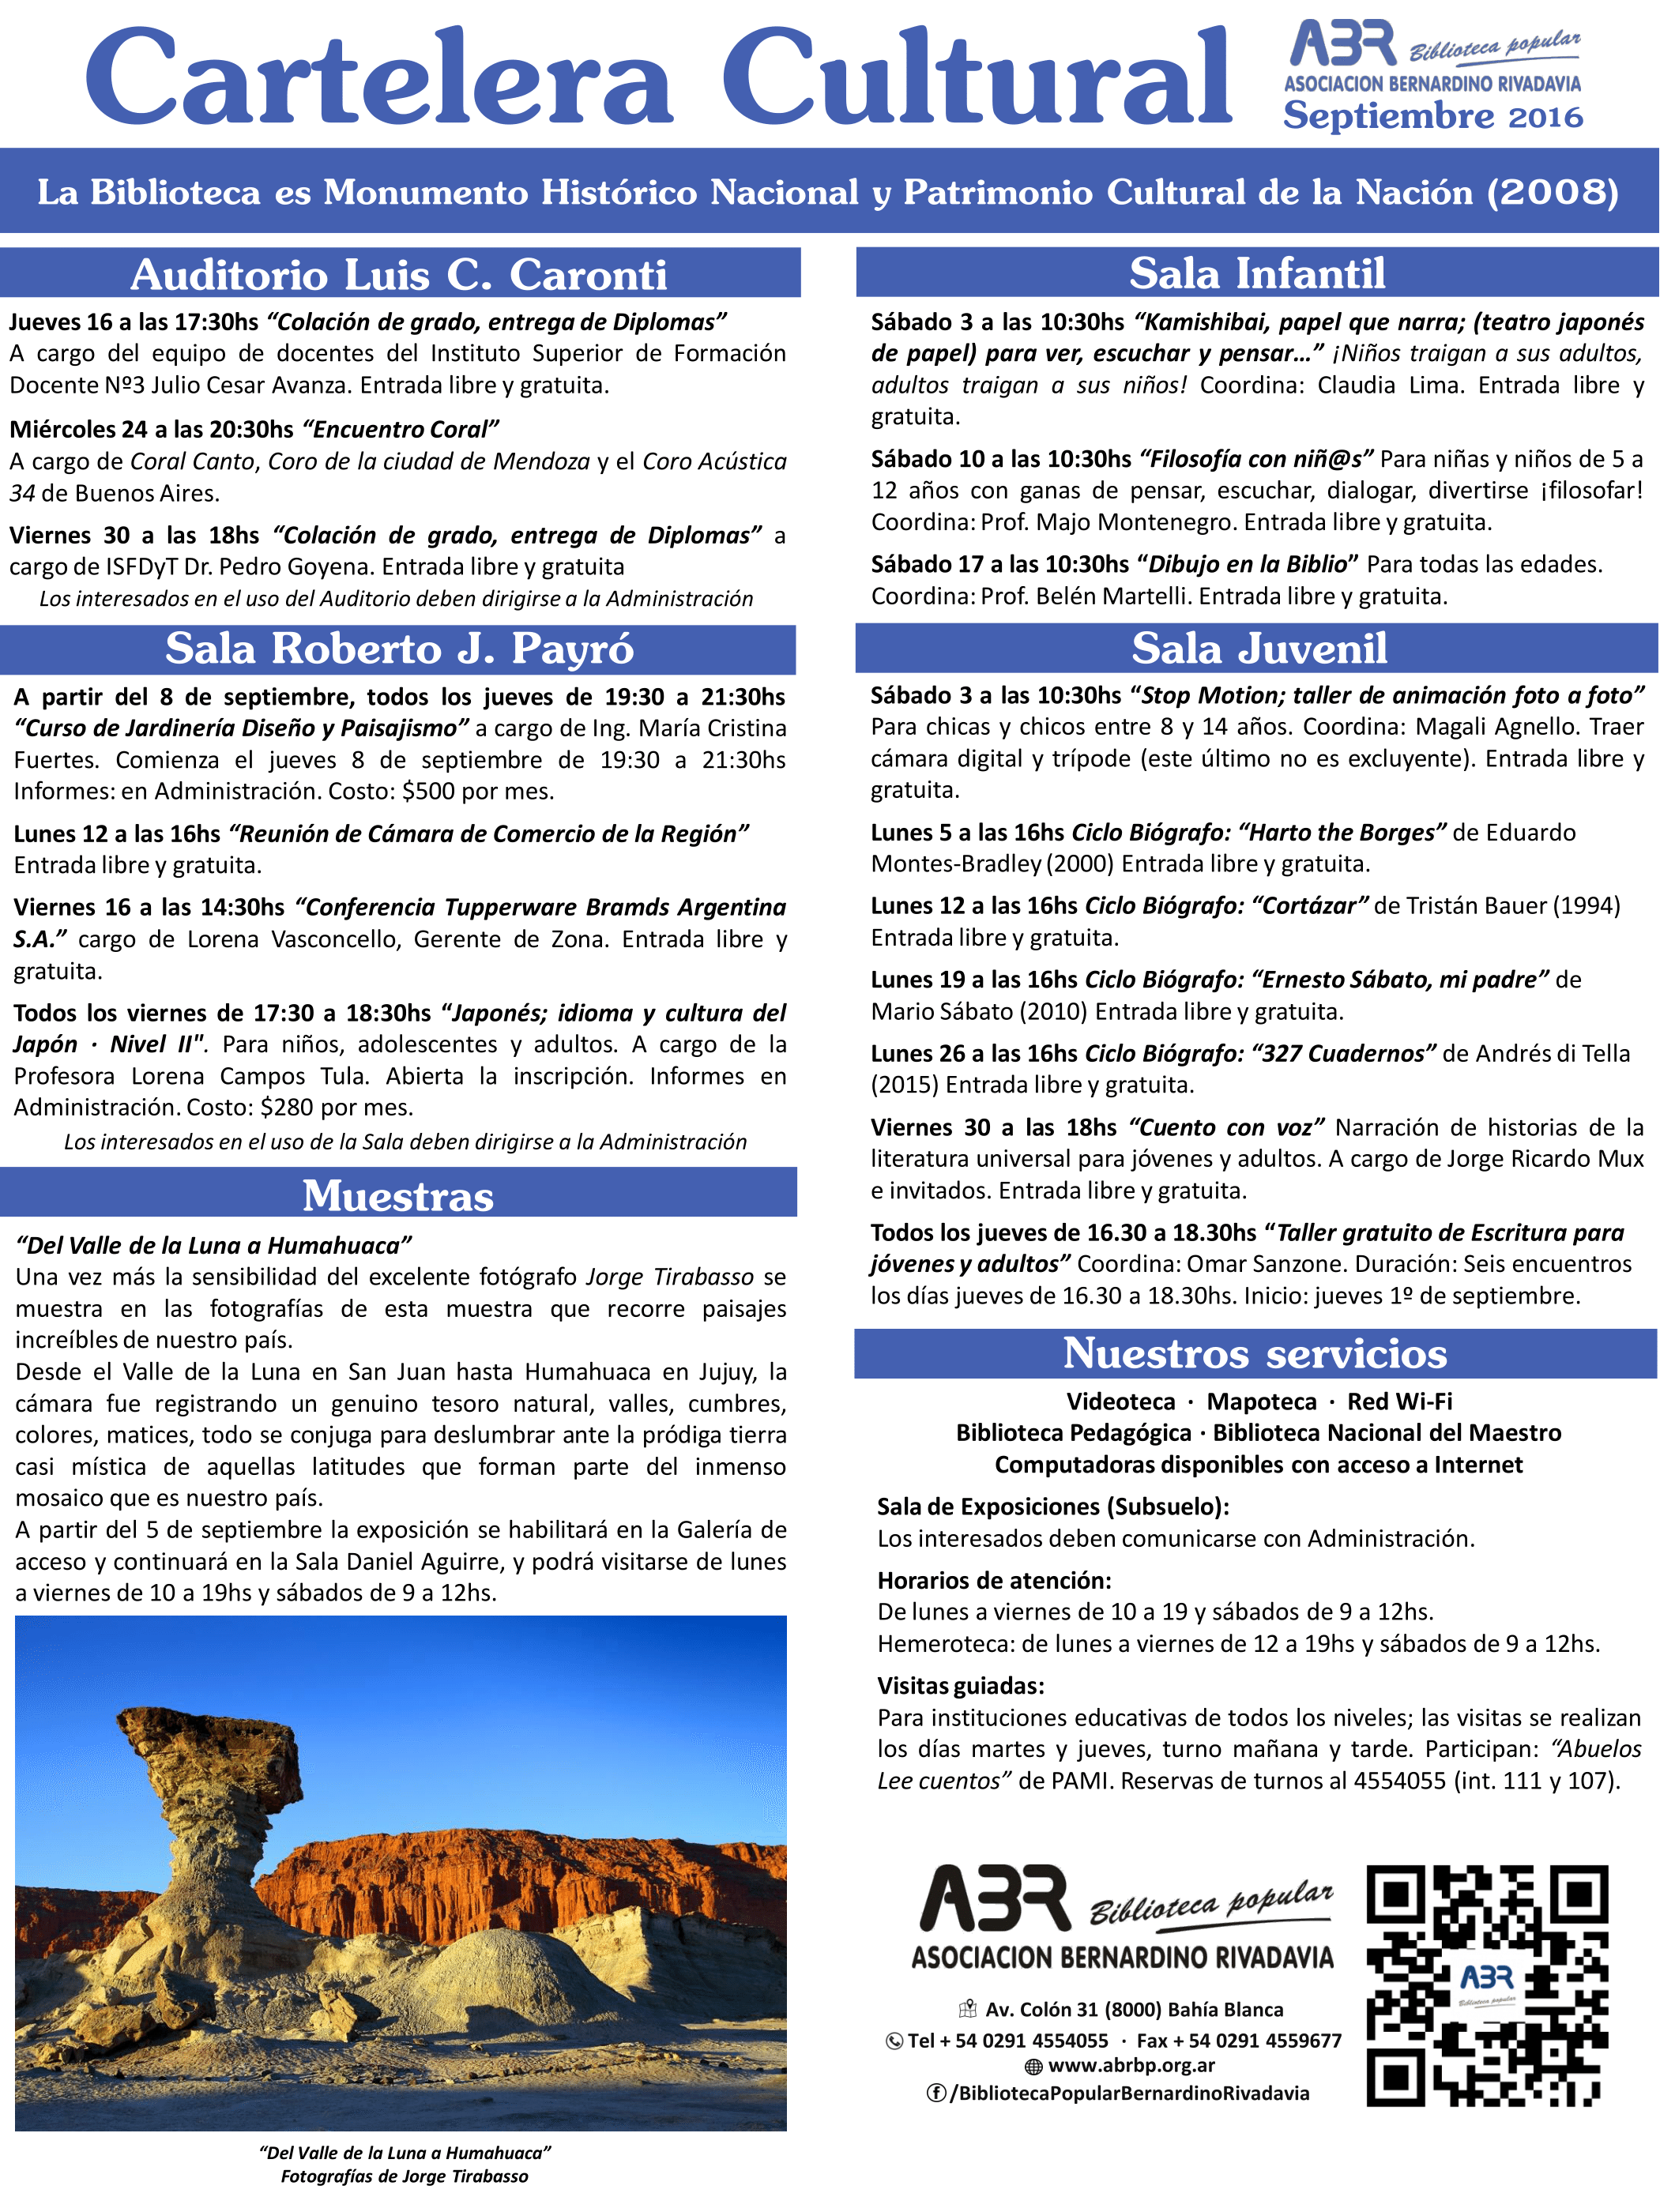 Cartelera-ABR-Septiembre